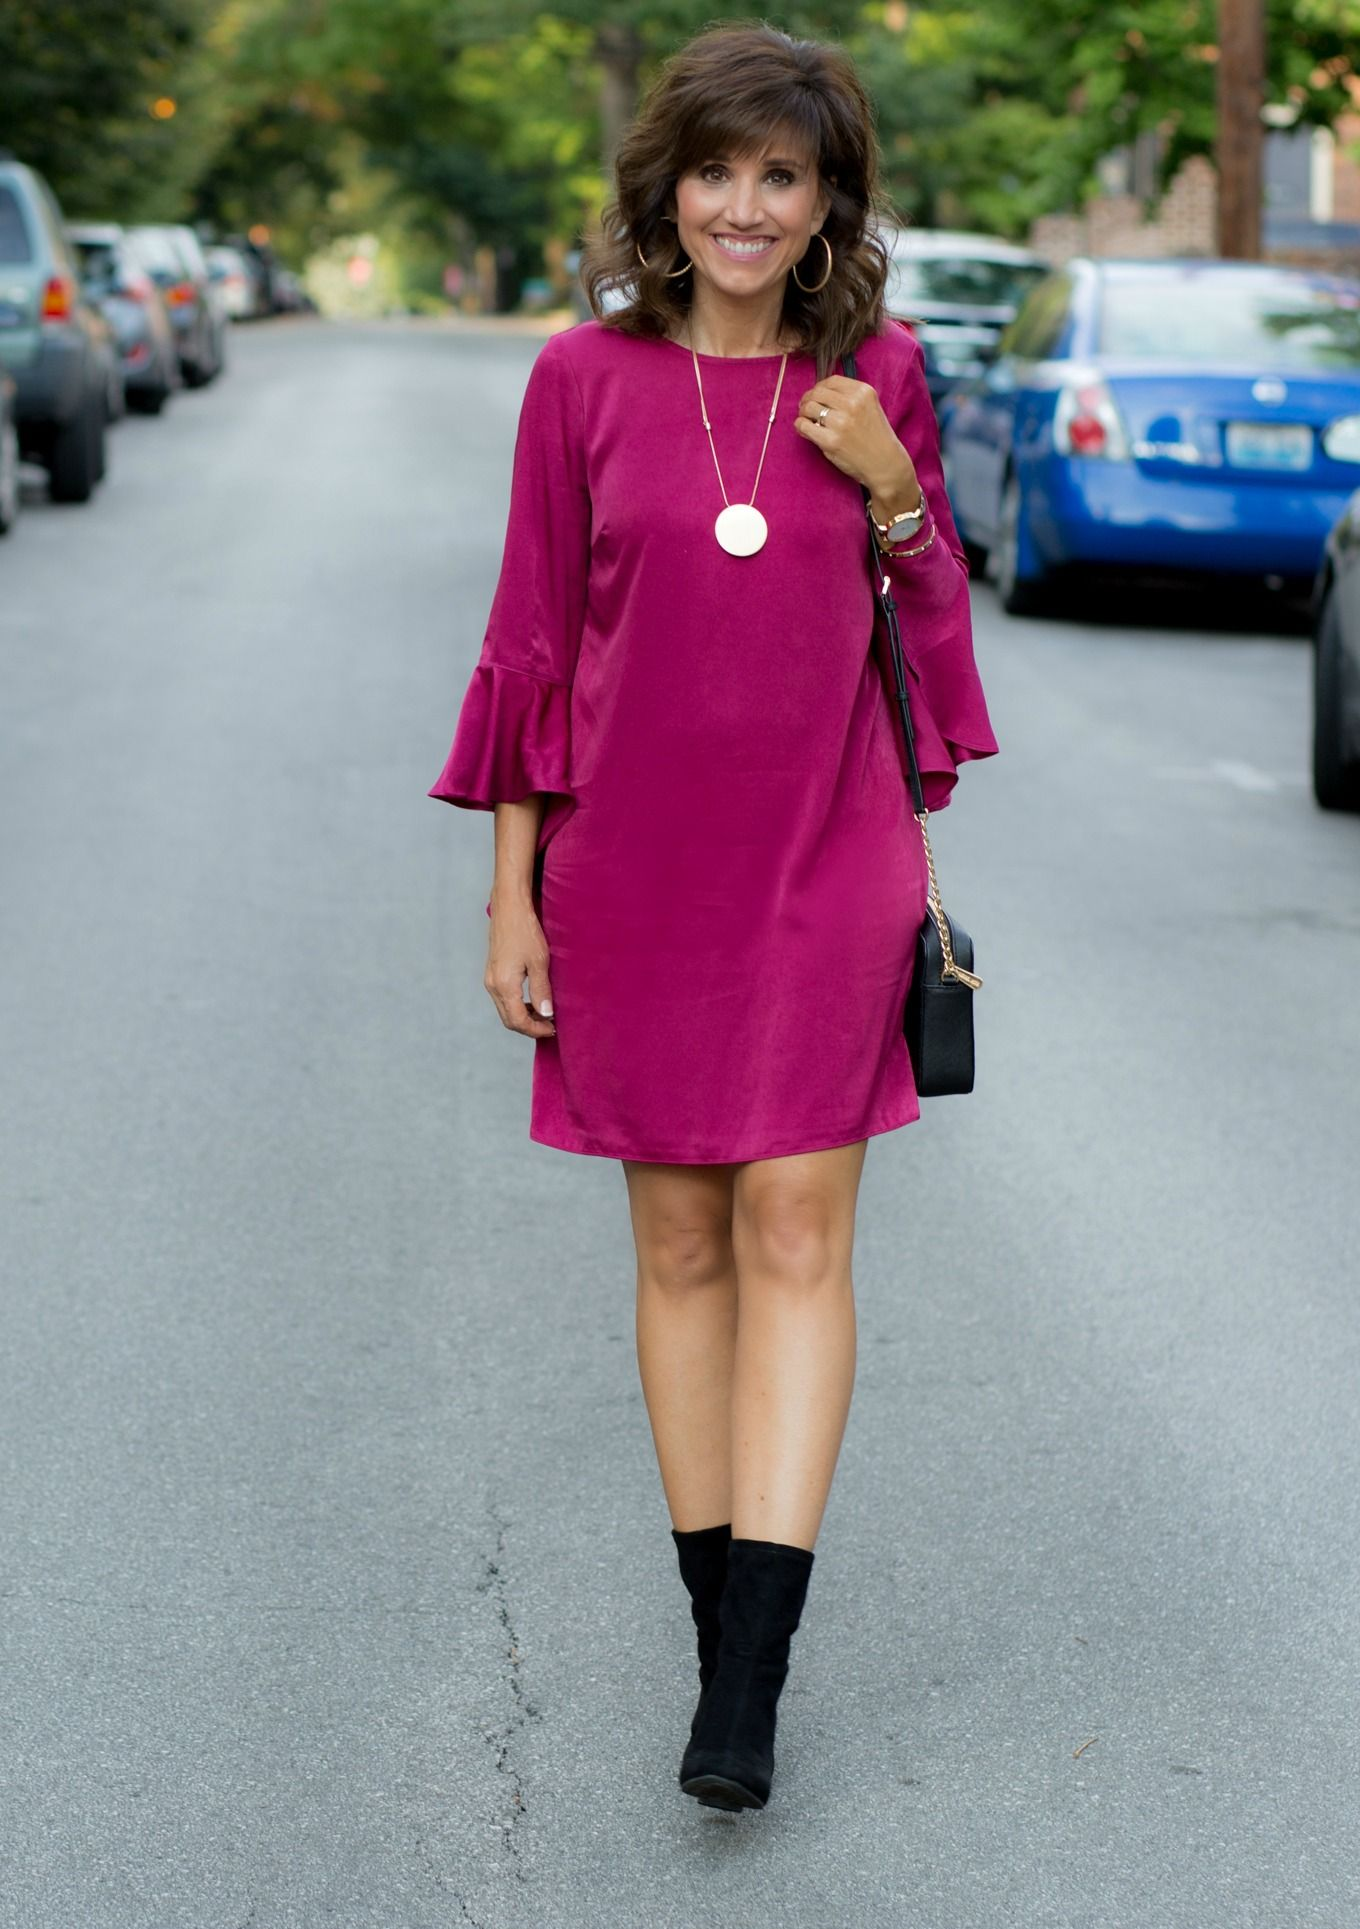 Ruffle Sleeve Dress for a Fall Wedding | Ruffle sleeve dress, Ruffle ...